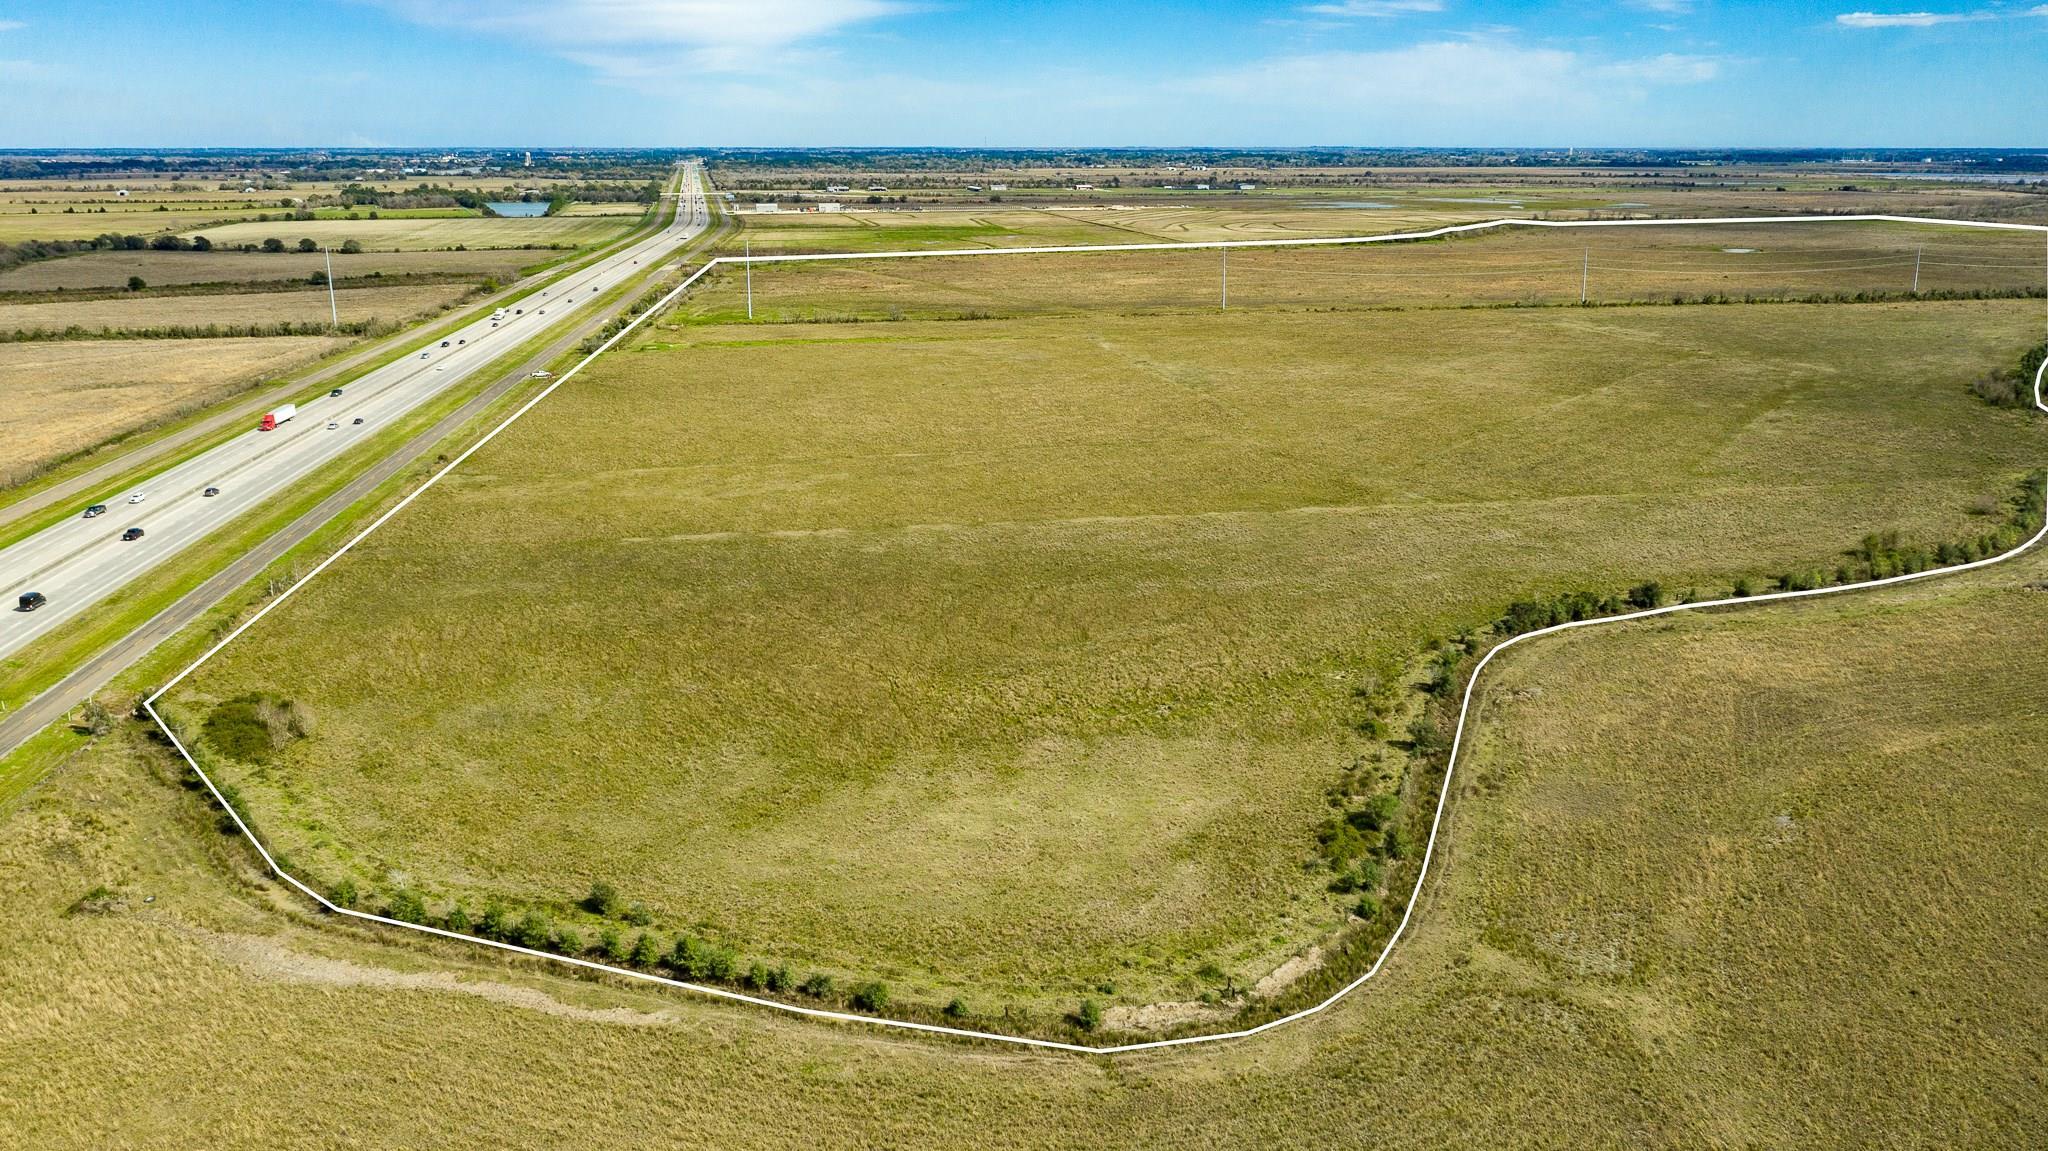 000 E Interstate 10 Property Photo